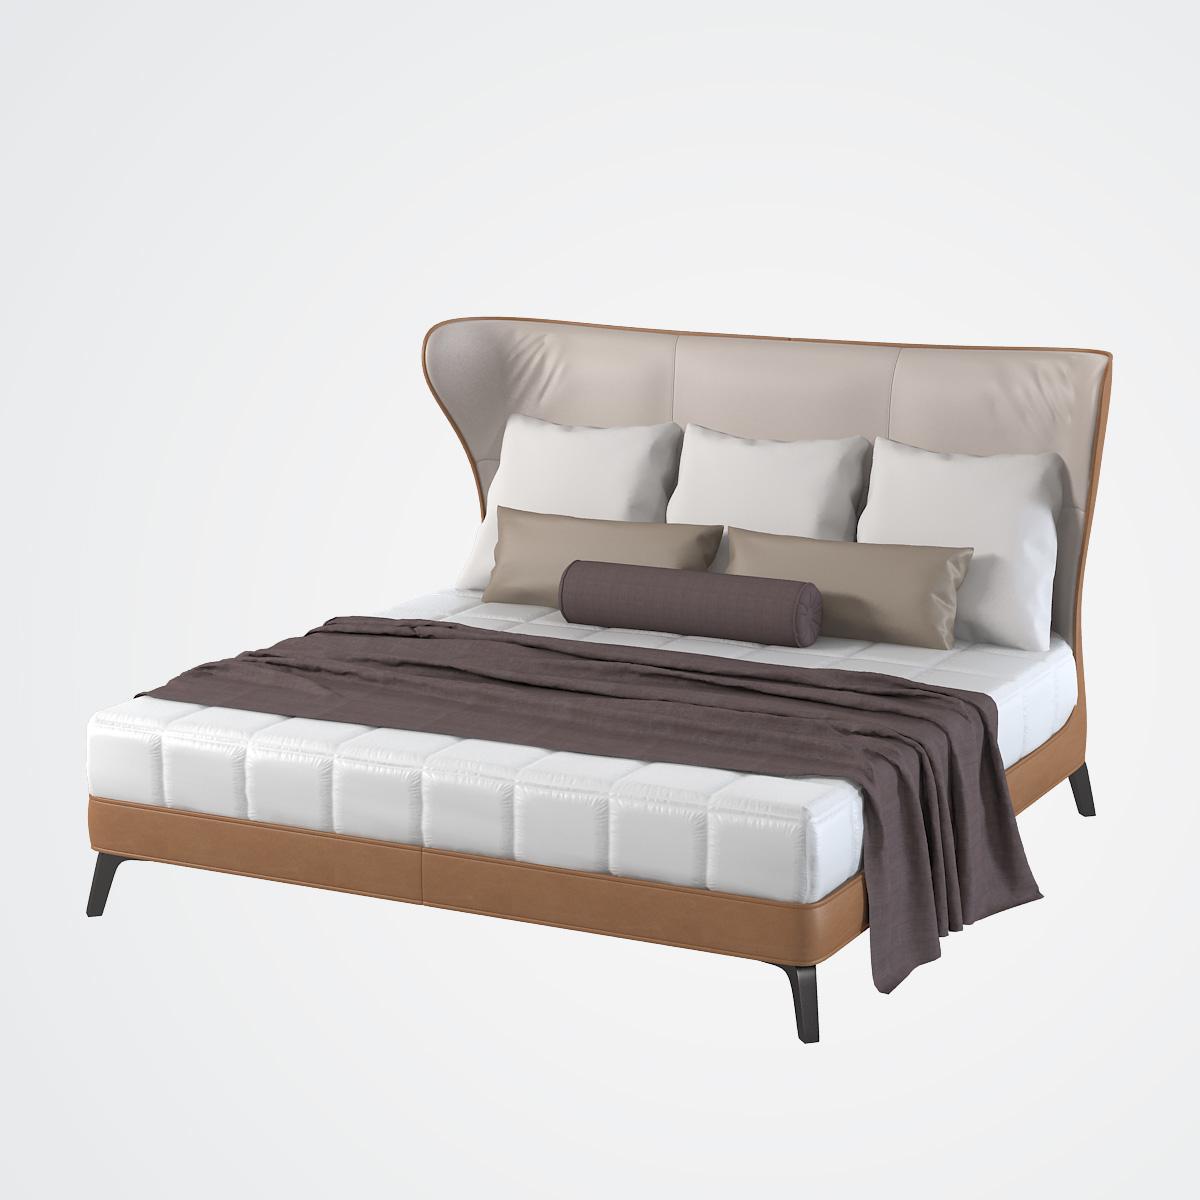 Poltrona Frau Mamy Blue Bed.Poltrona Frau Mamy Blue Bed